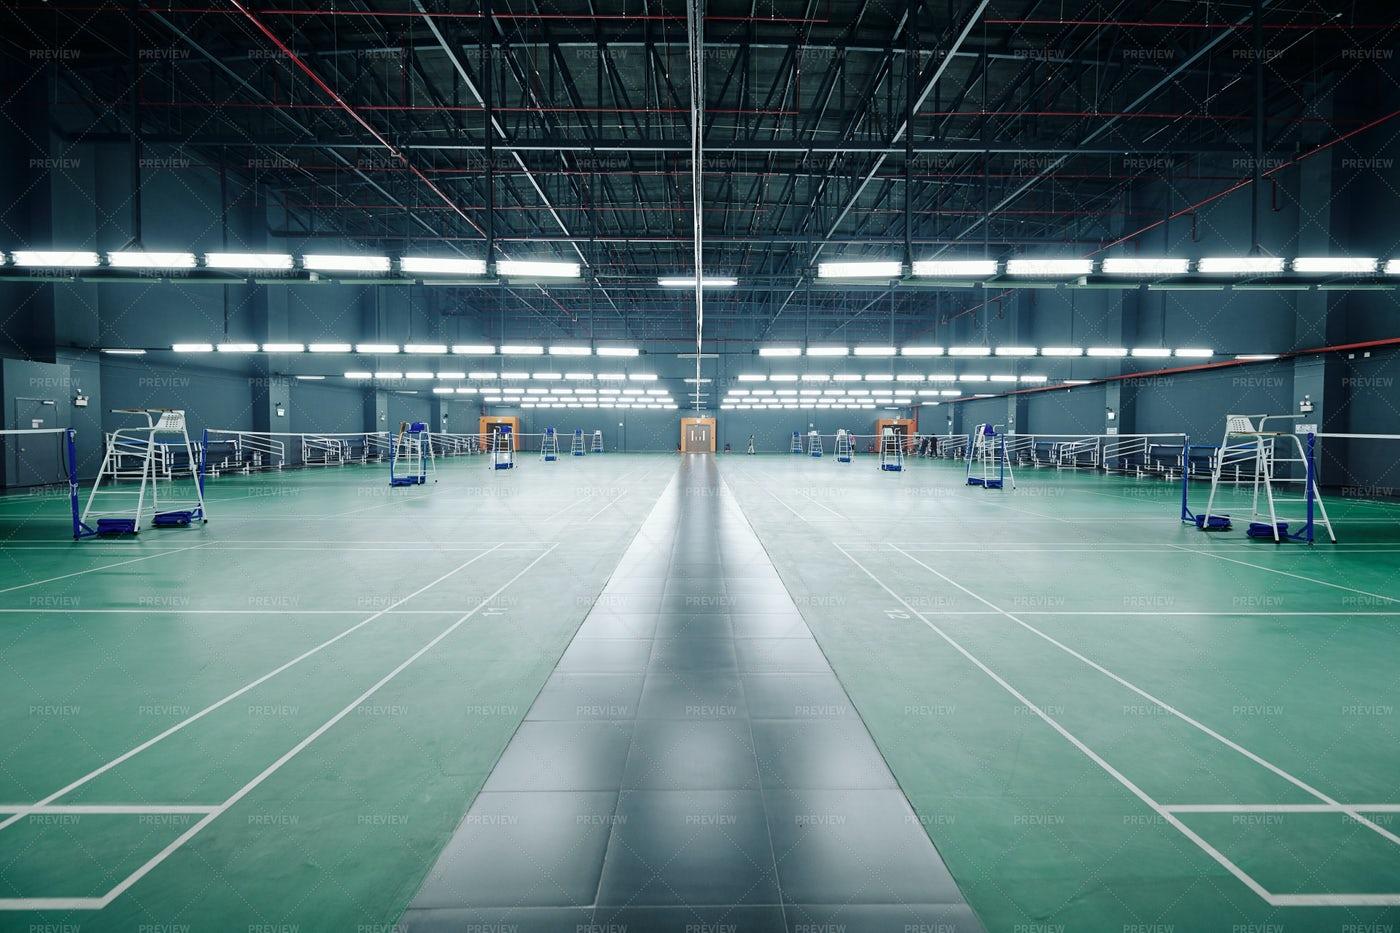 Empty Gymnasium With Courts: Stock Photos